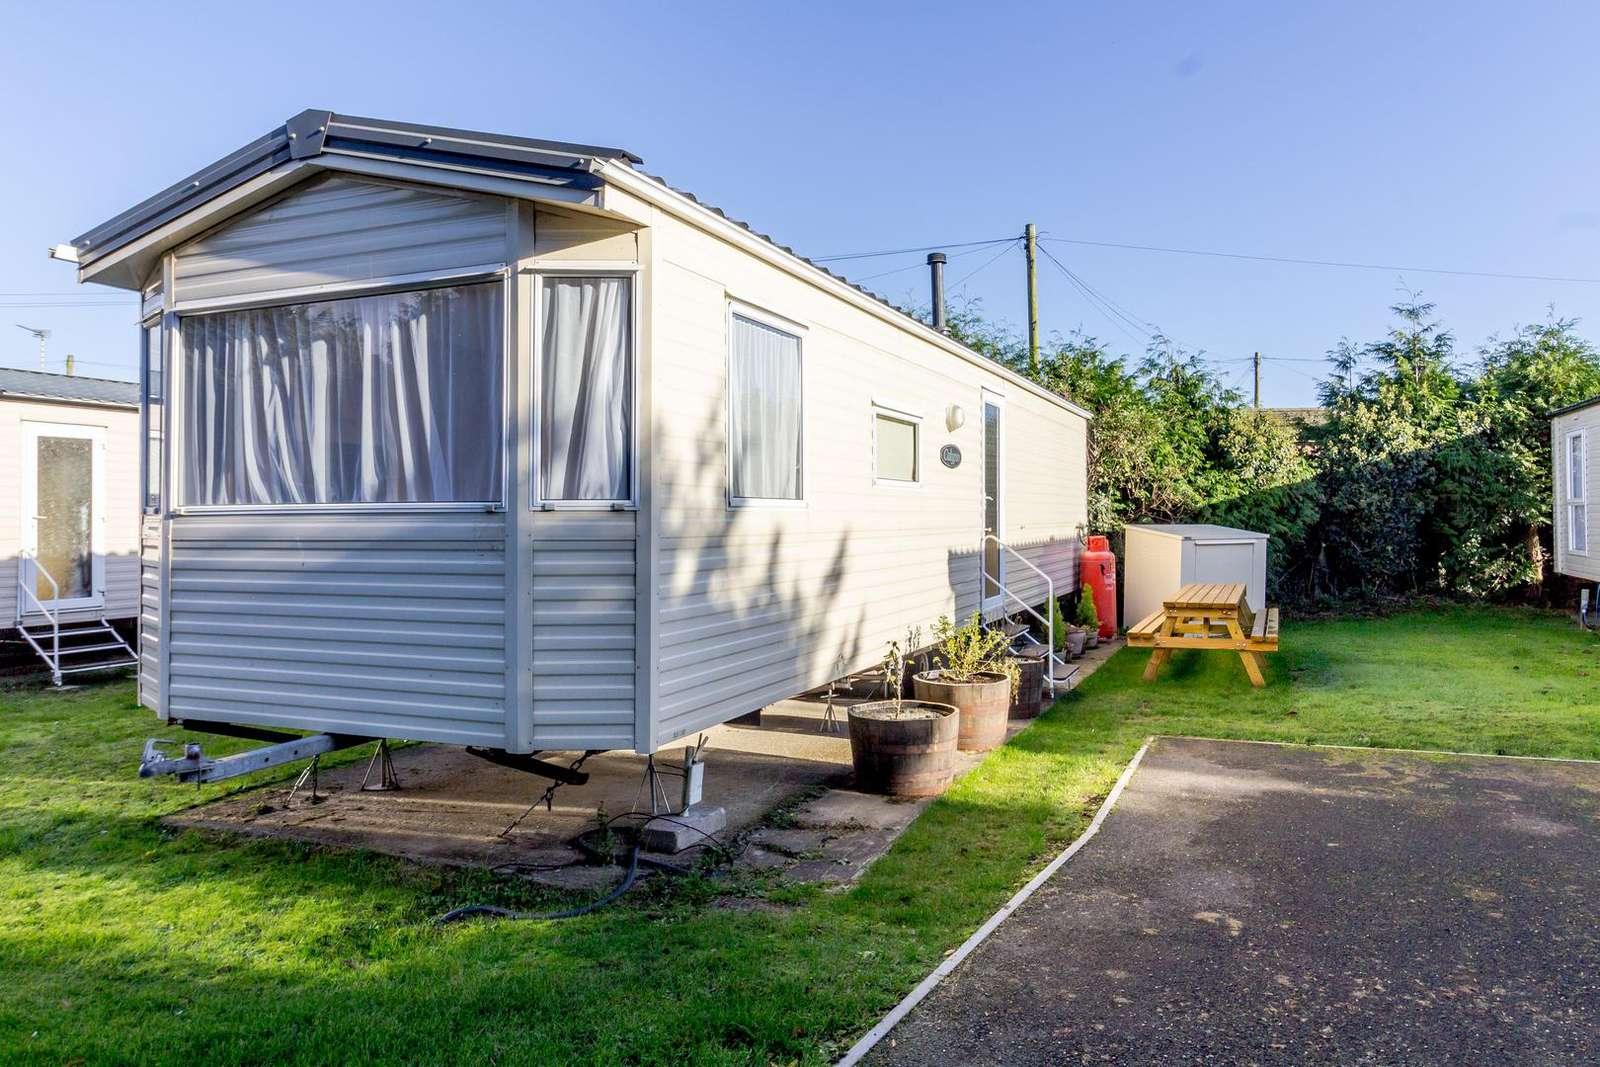 10005G – G area – 3 bed, 8 berth caravan. Emerald rated. - property